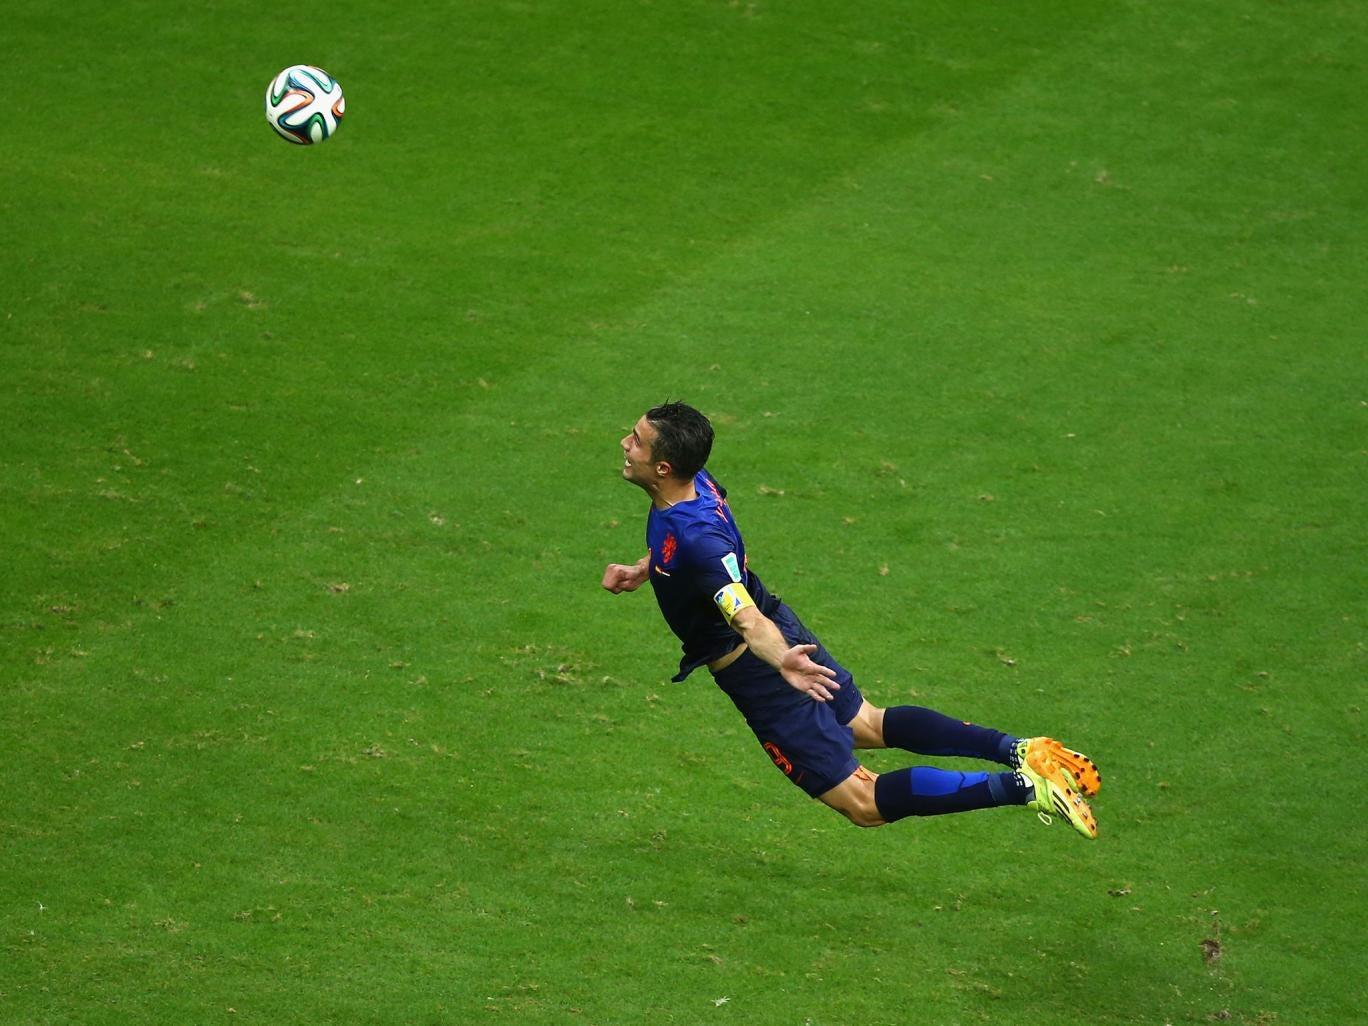 Robin van Persie scores a header in the Netherlands' 5-1 victory over Spain